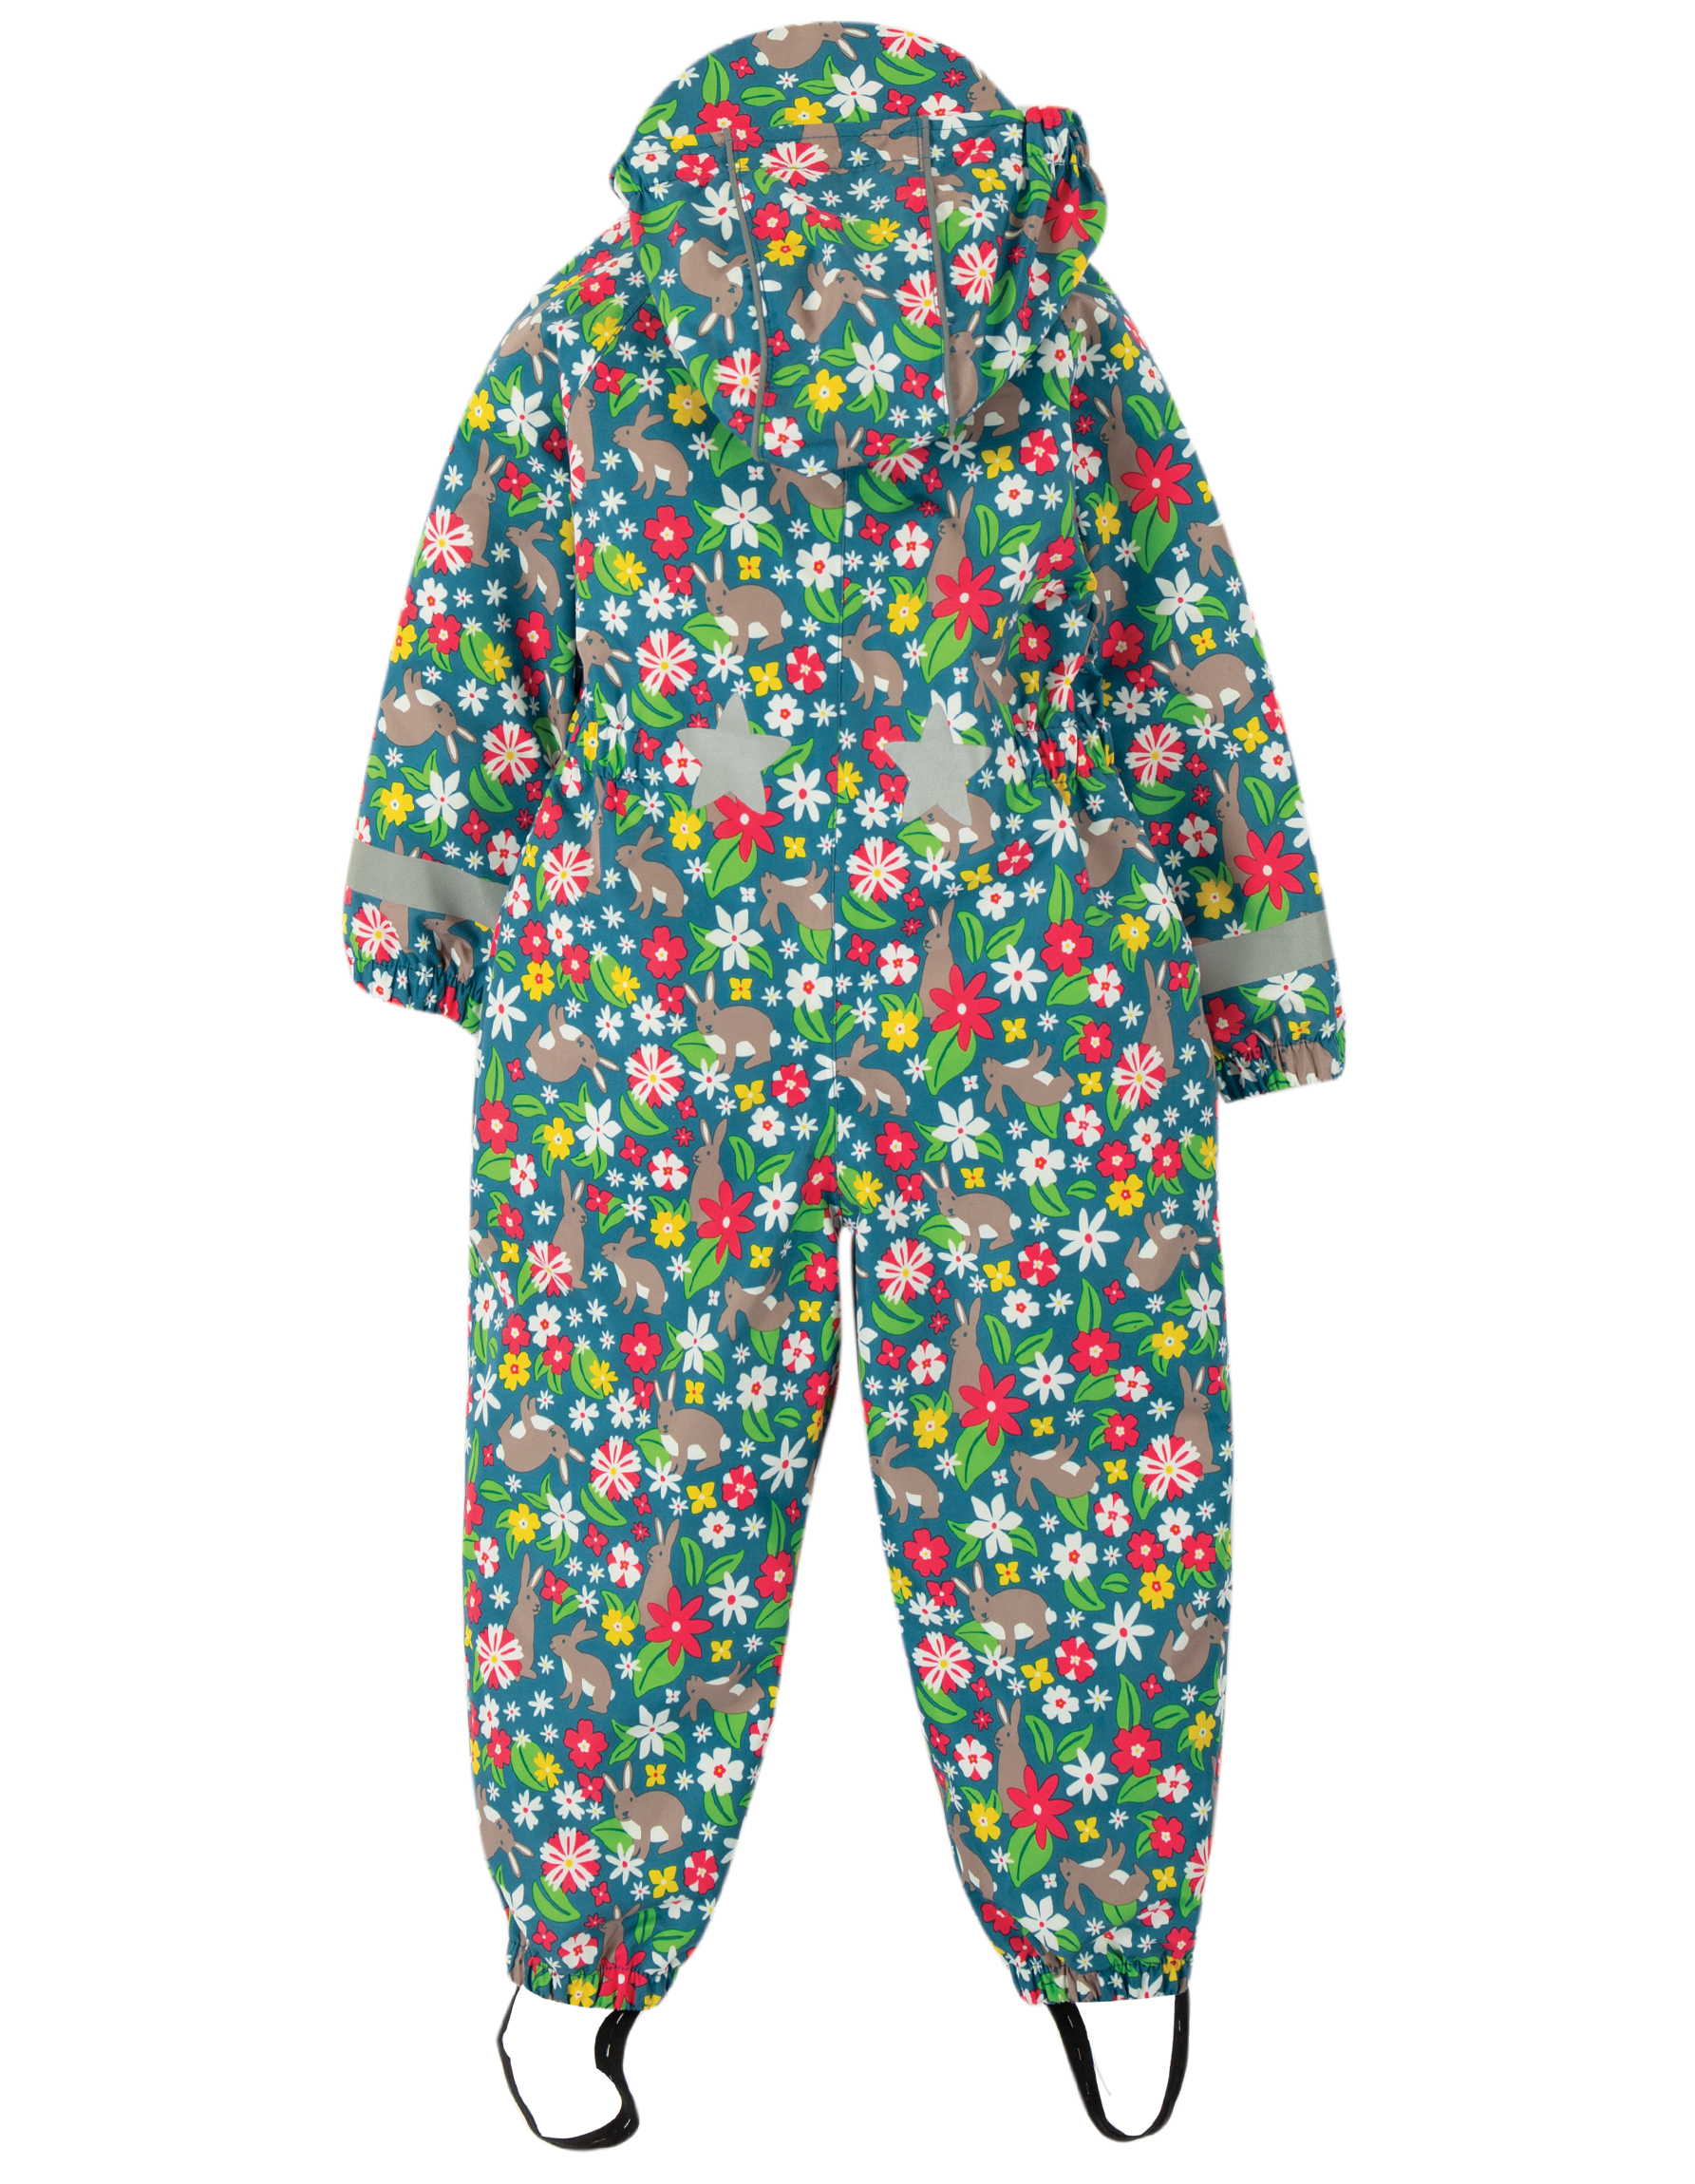 Frugi - Rain or Shine suit - Rabbit Fields